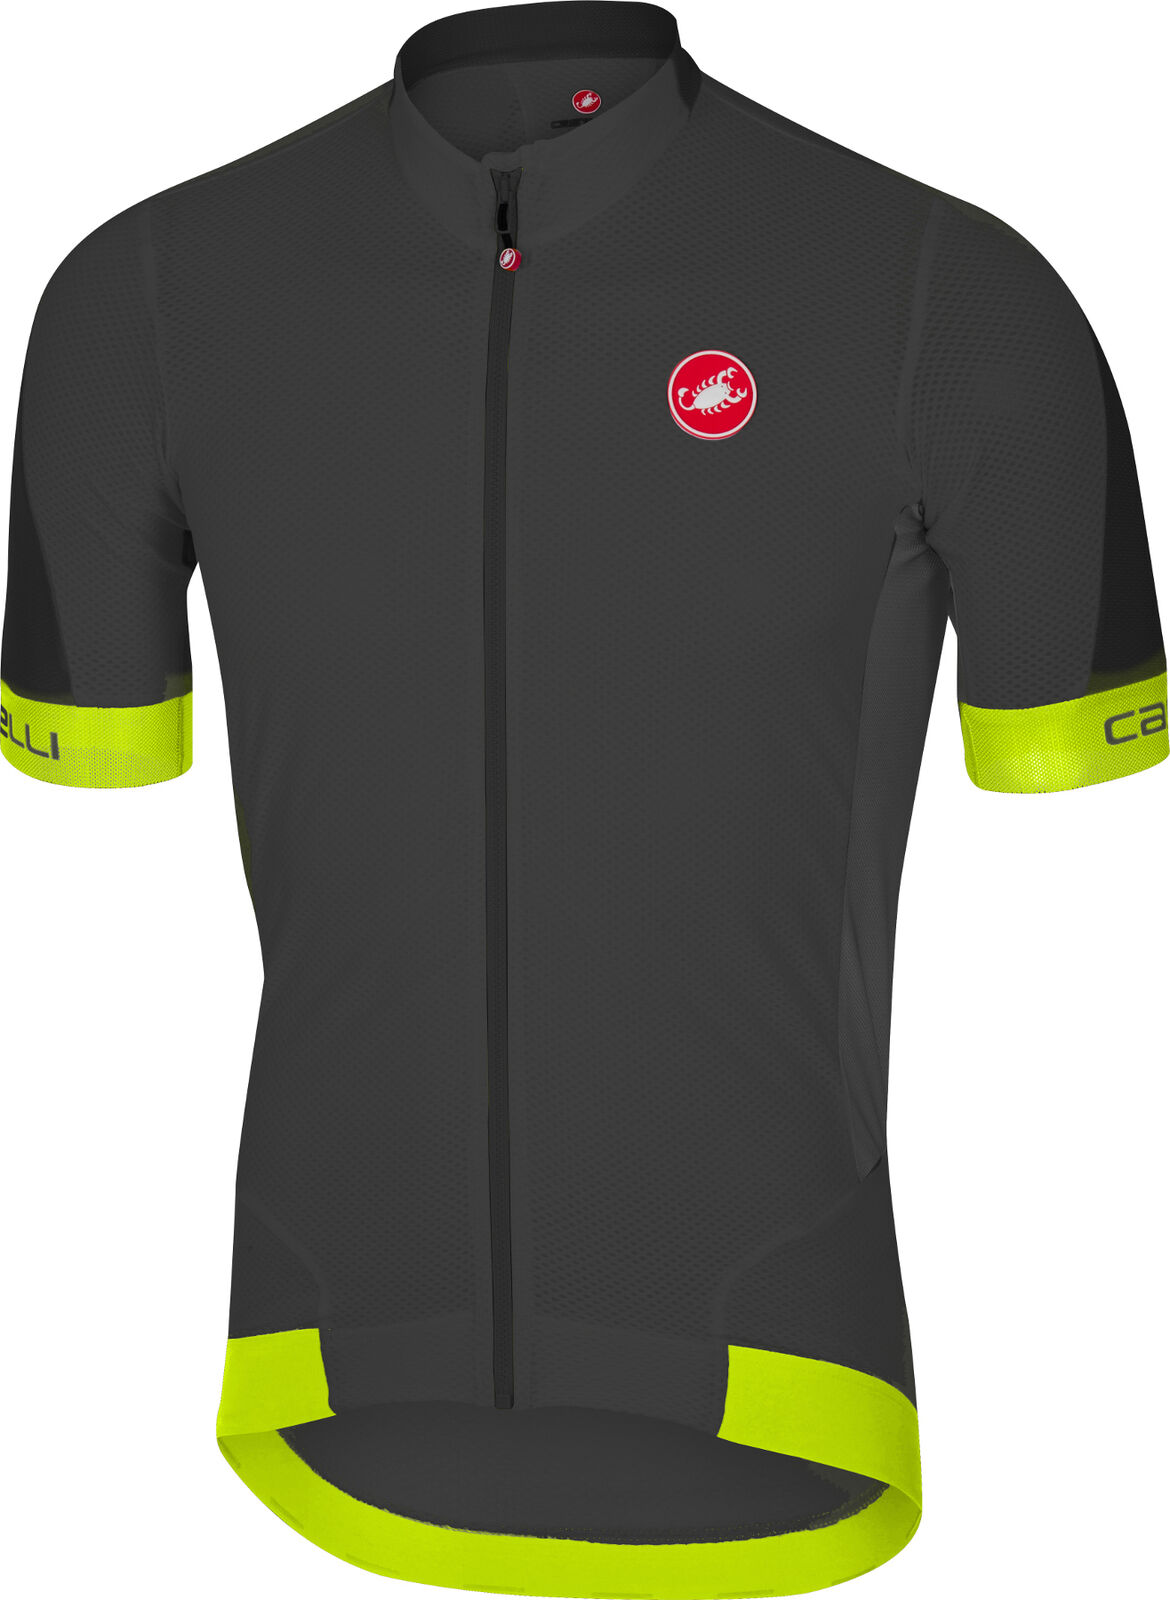 Castelli volata 2 bicicletas suéteres FZ sin humo 2018